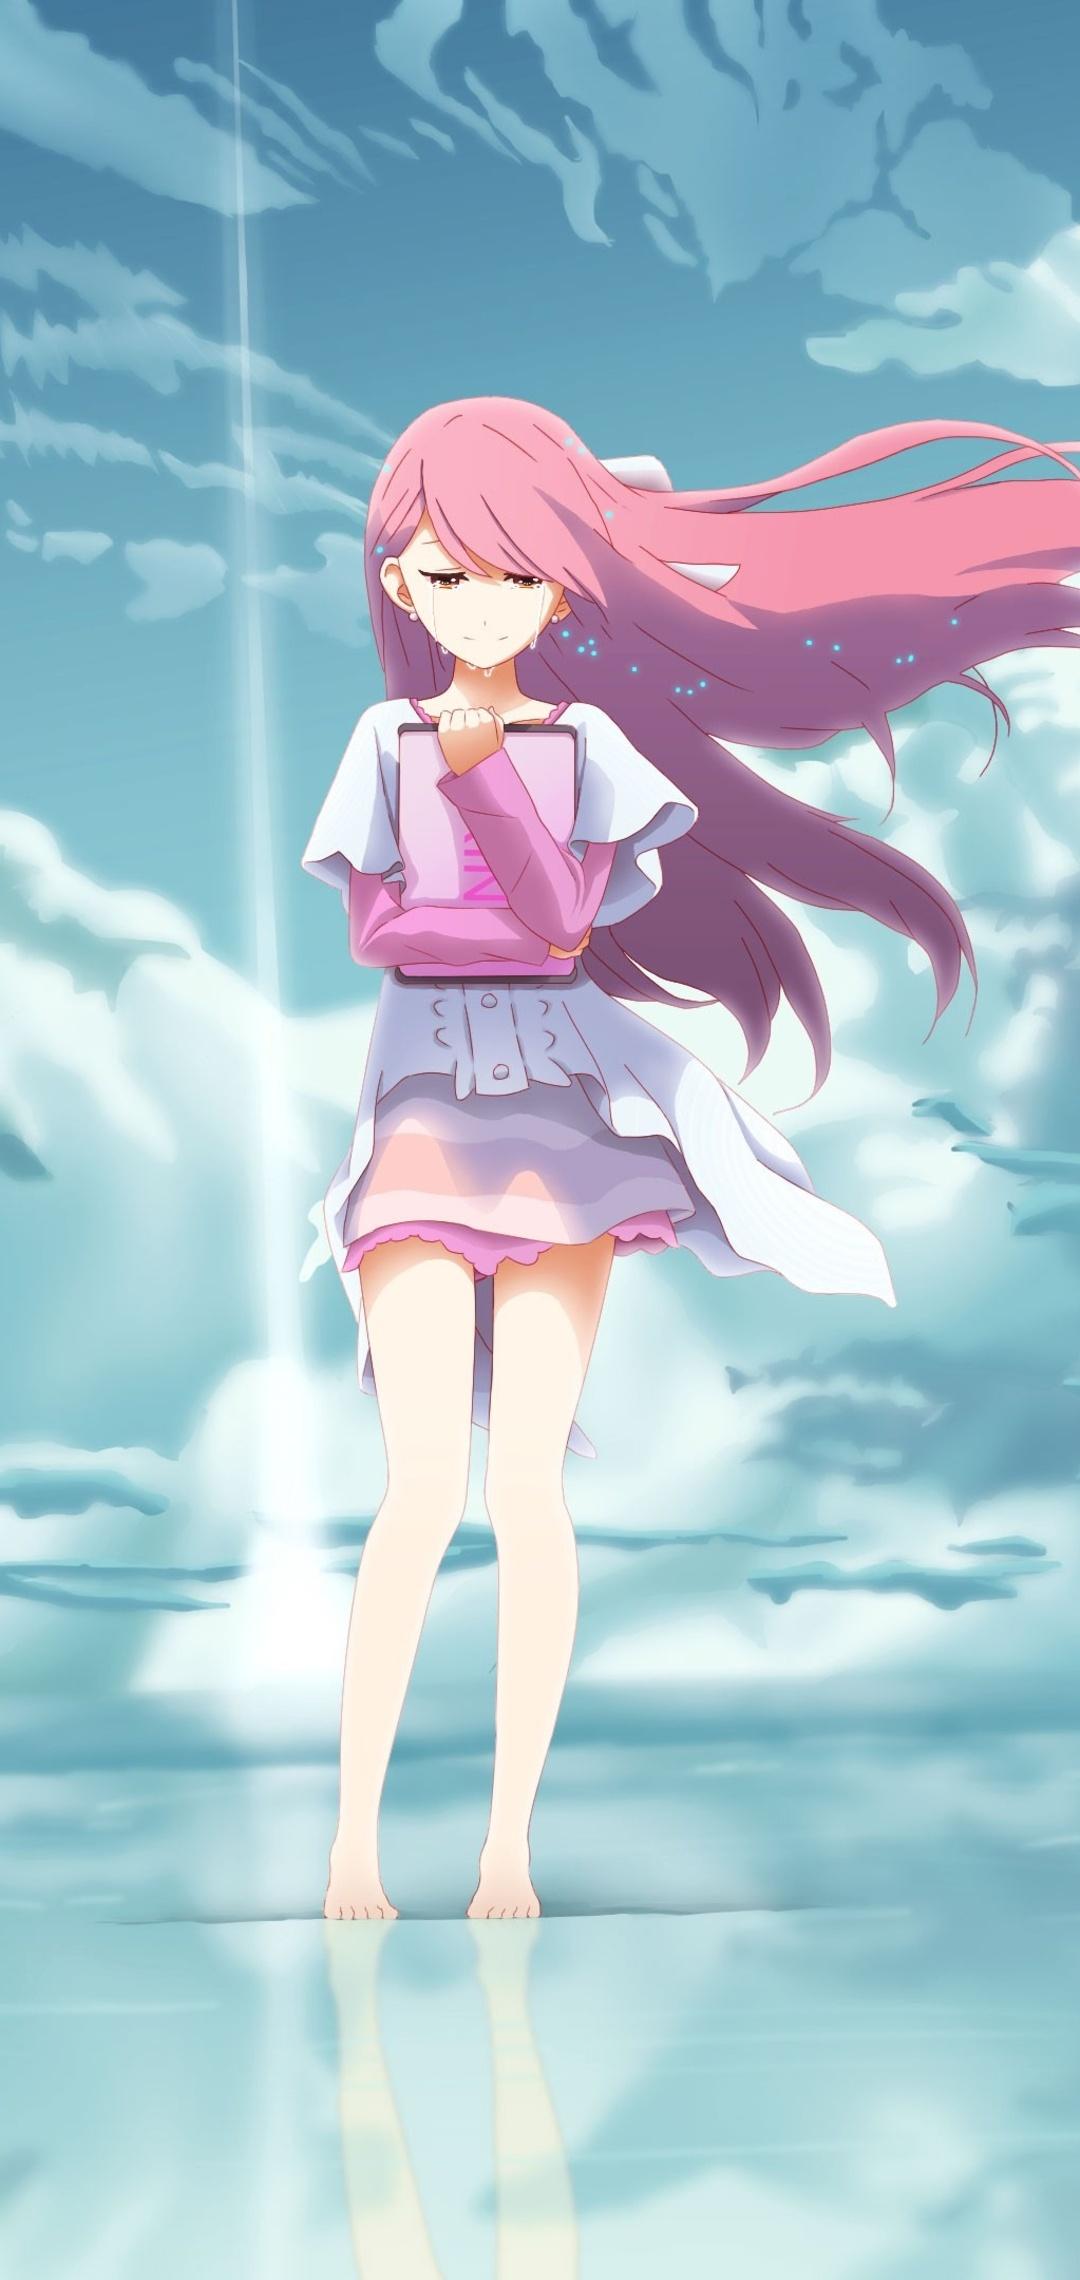 Download 800+ Wallpaper Anime Hd Android Xiaomi  Terbaik